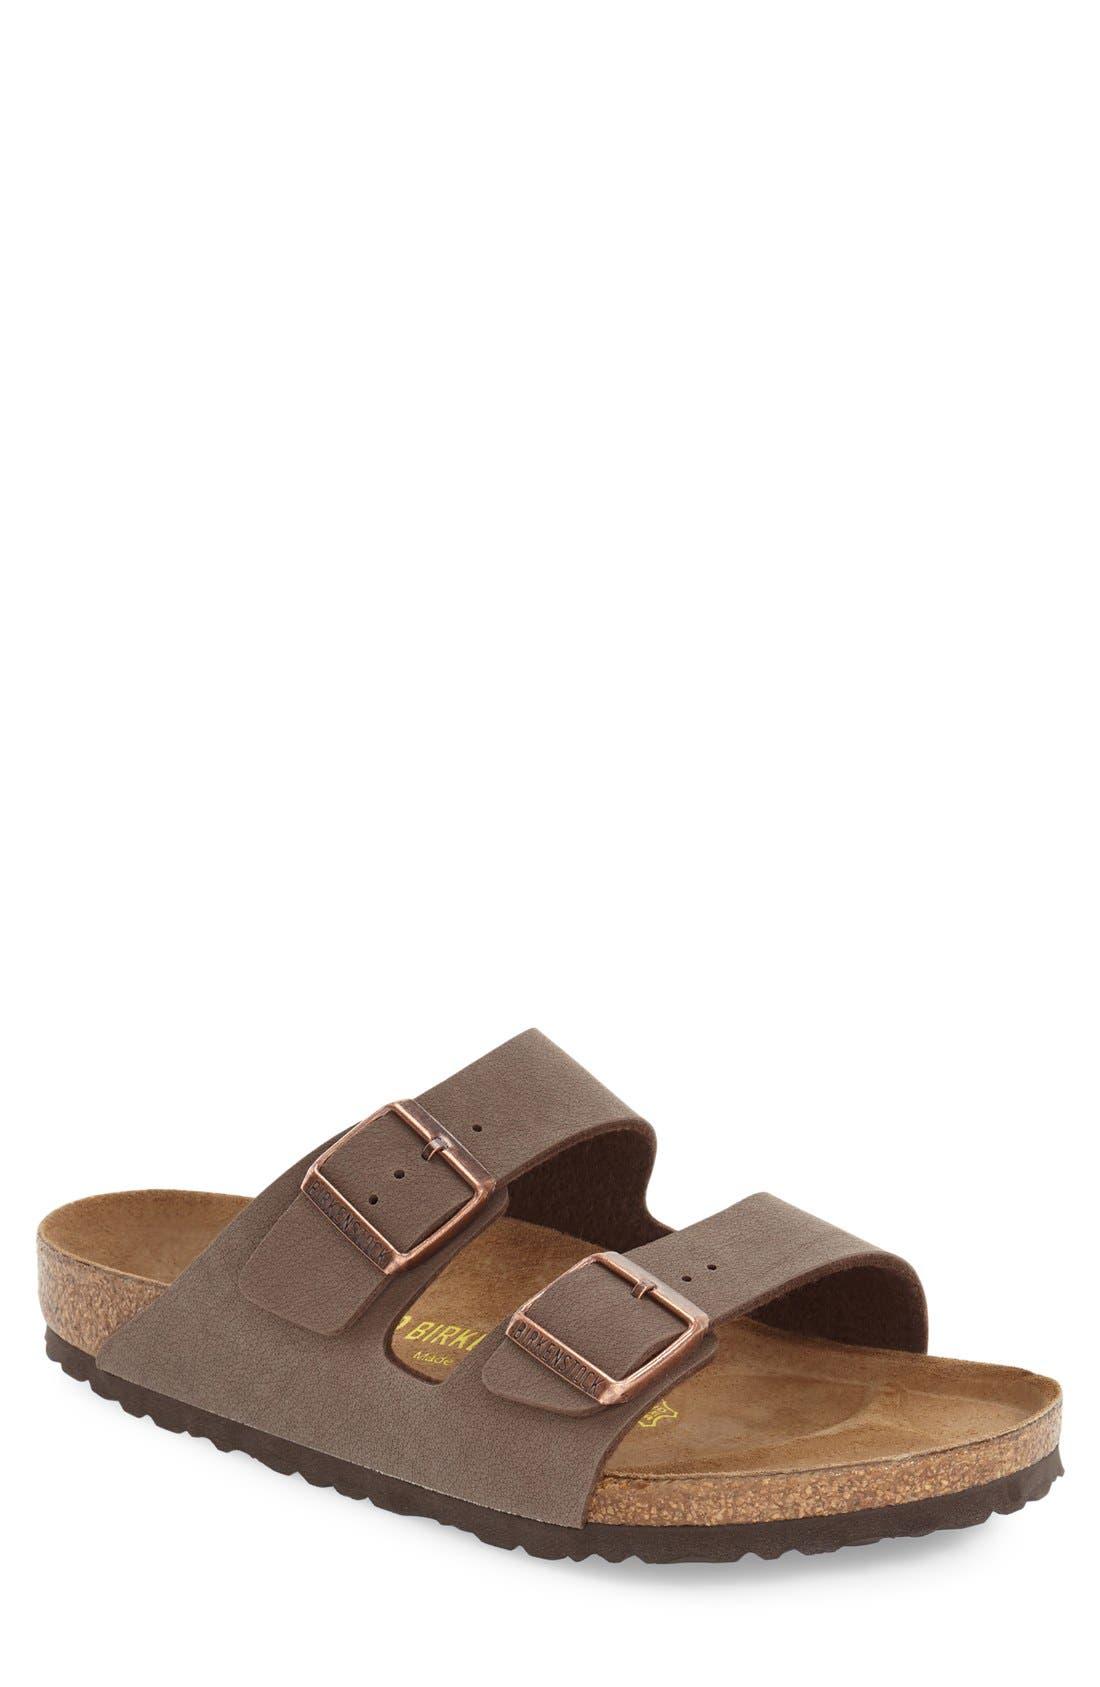 UPC 809410059246 Men's Birkenstock Arizona Slide Sandal